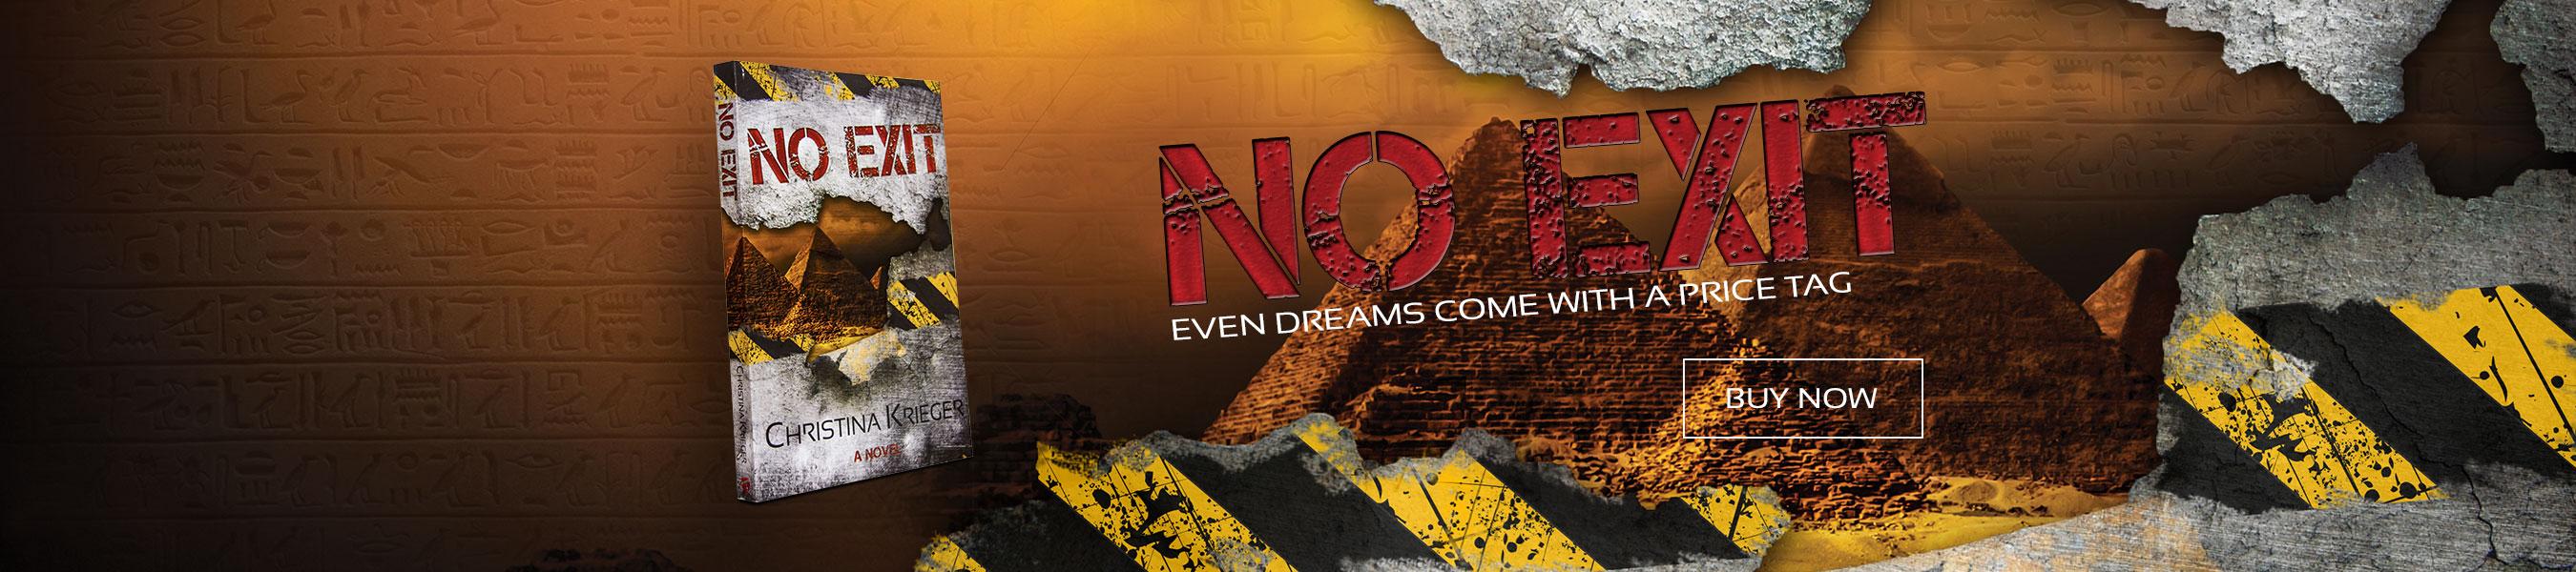 No Exit by Christina Krieger